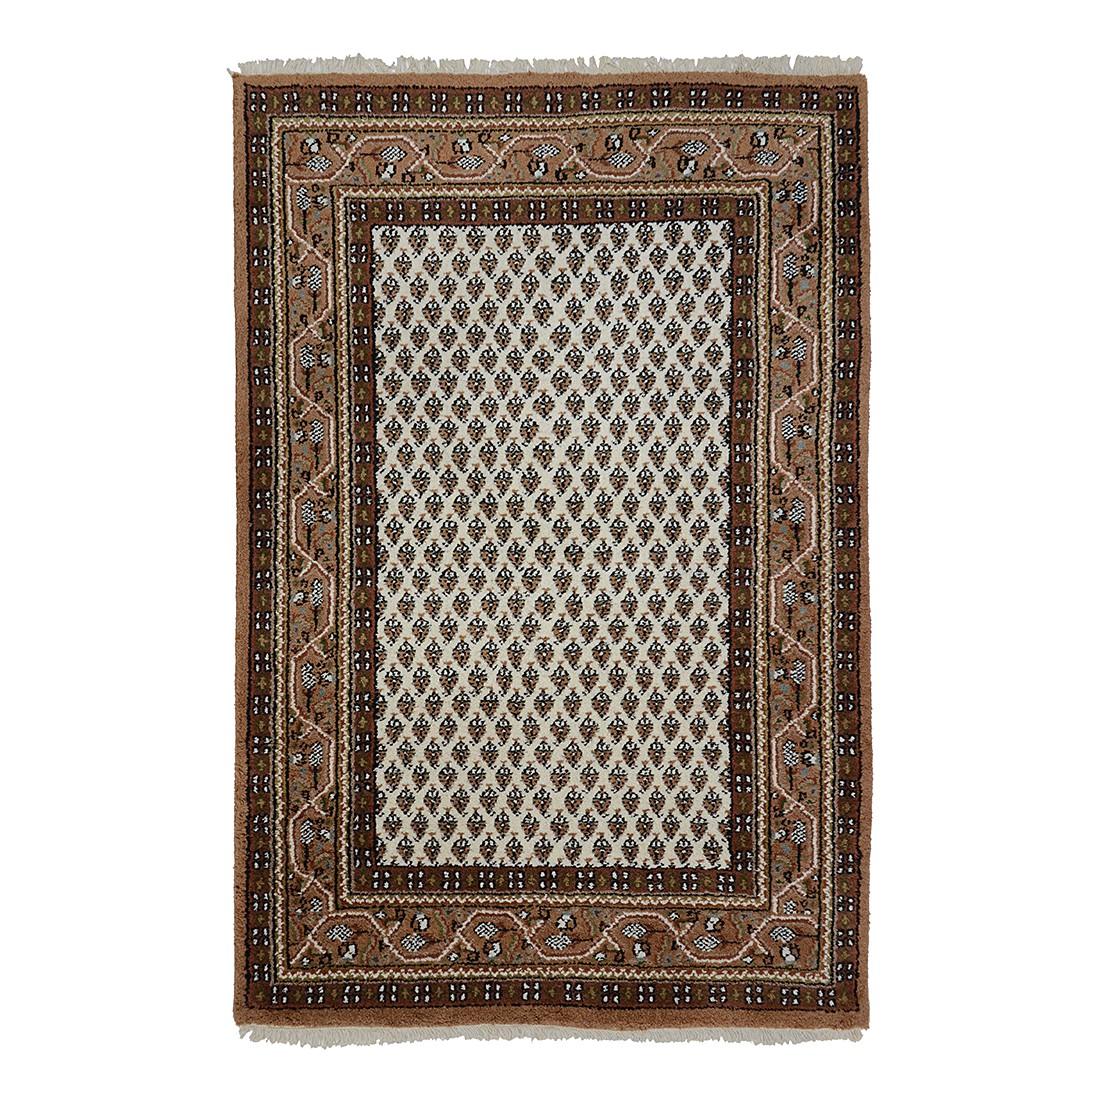 Tapijt Indo Mir Dehli - beige 100% wol 70x140cm, Parwis